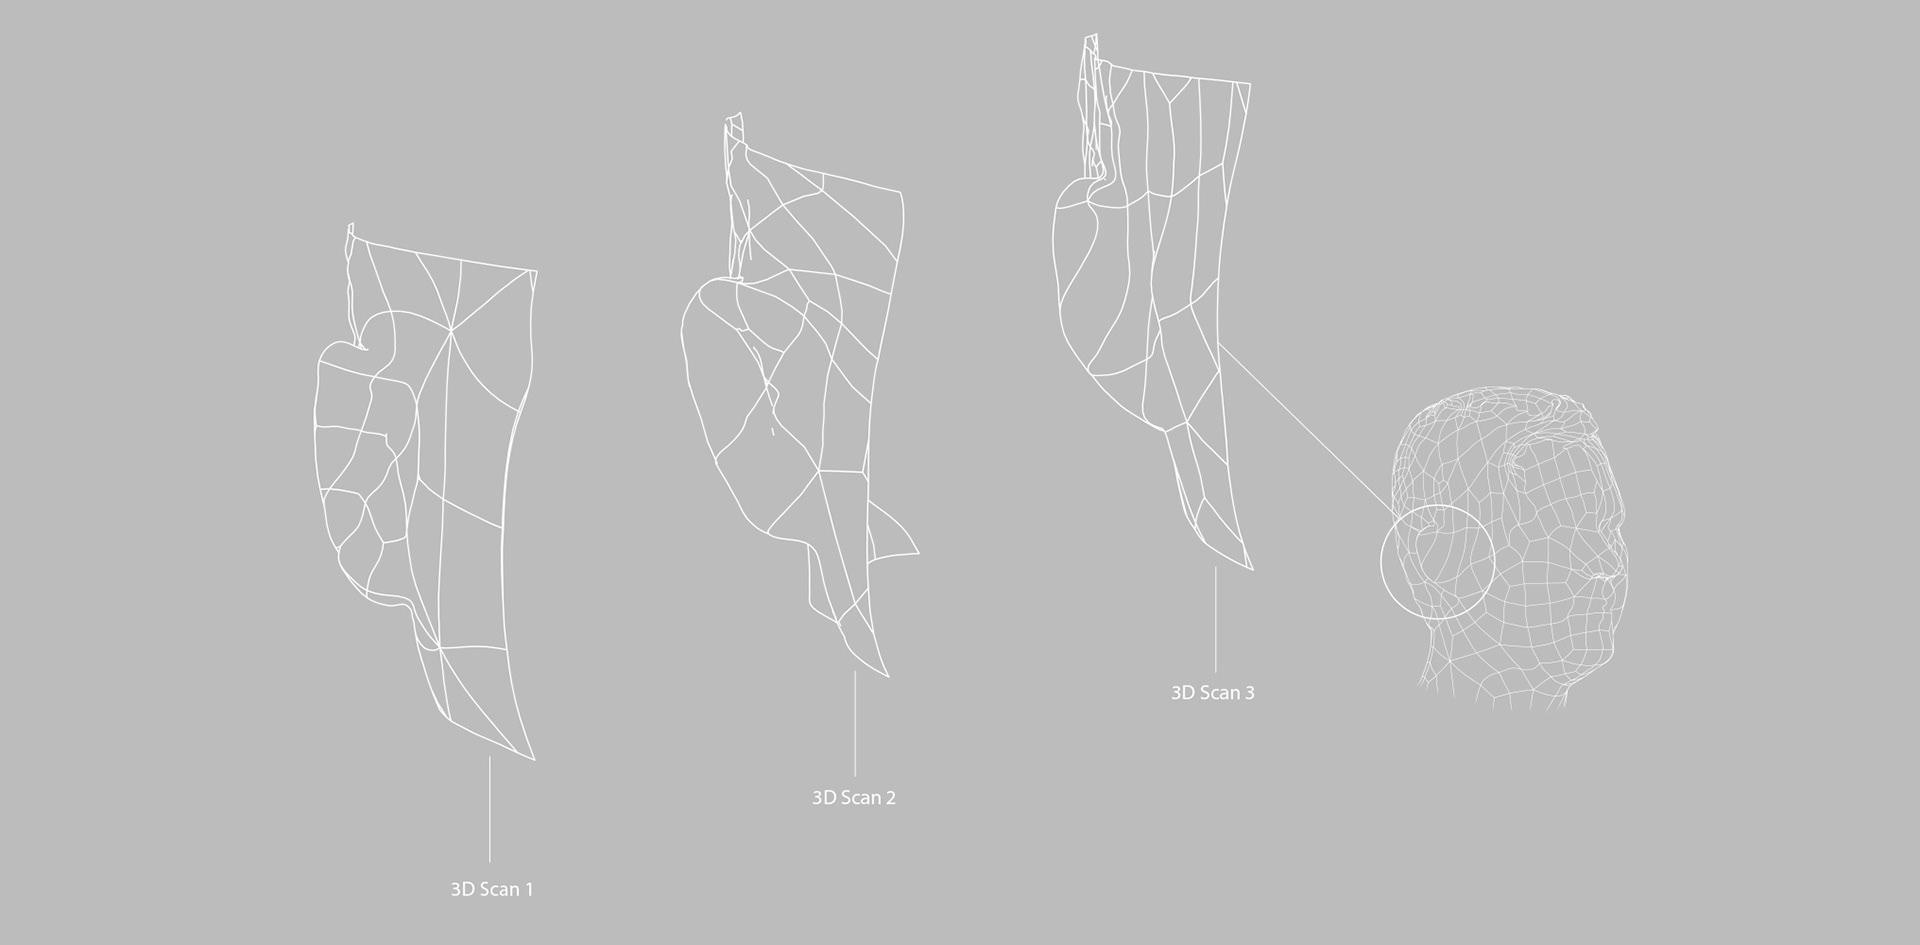 Vicon Cara | Ergonomically design for comfort